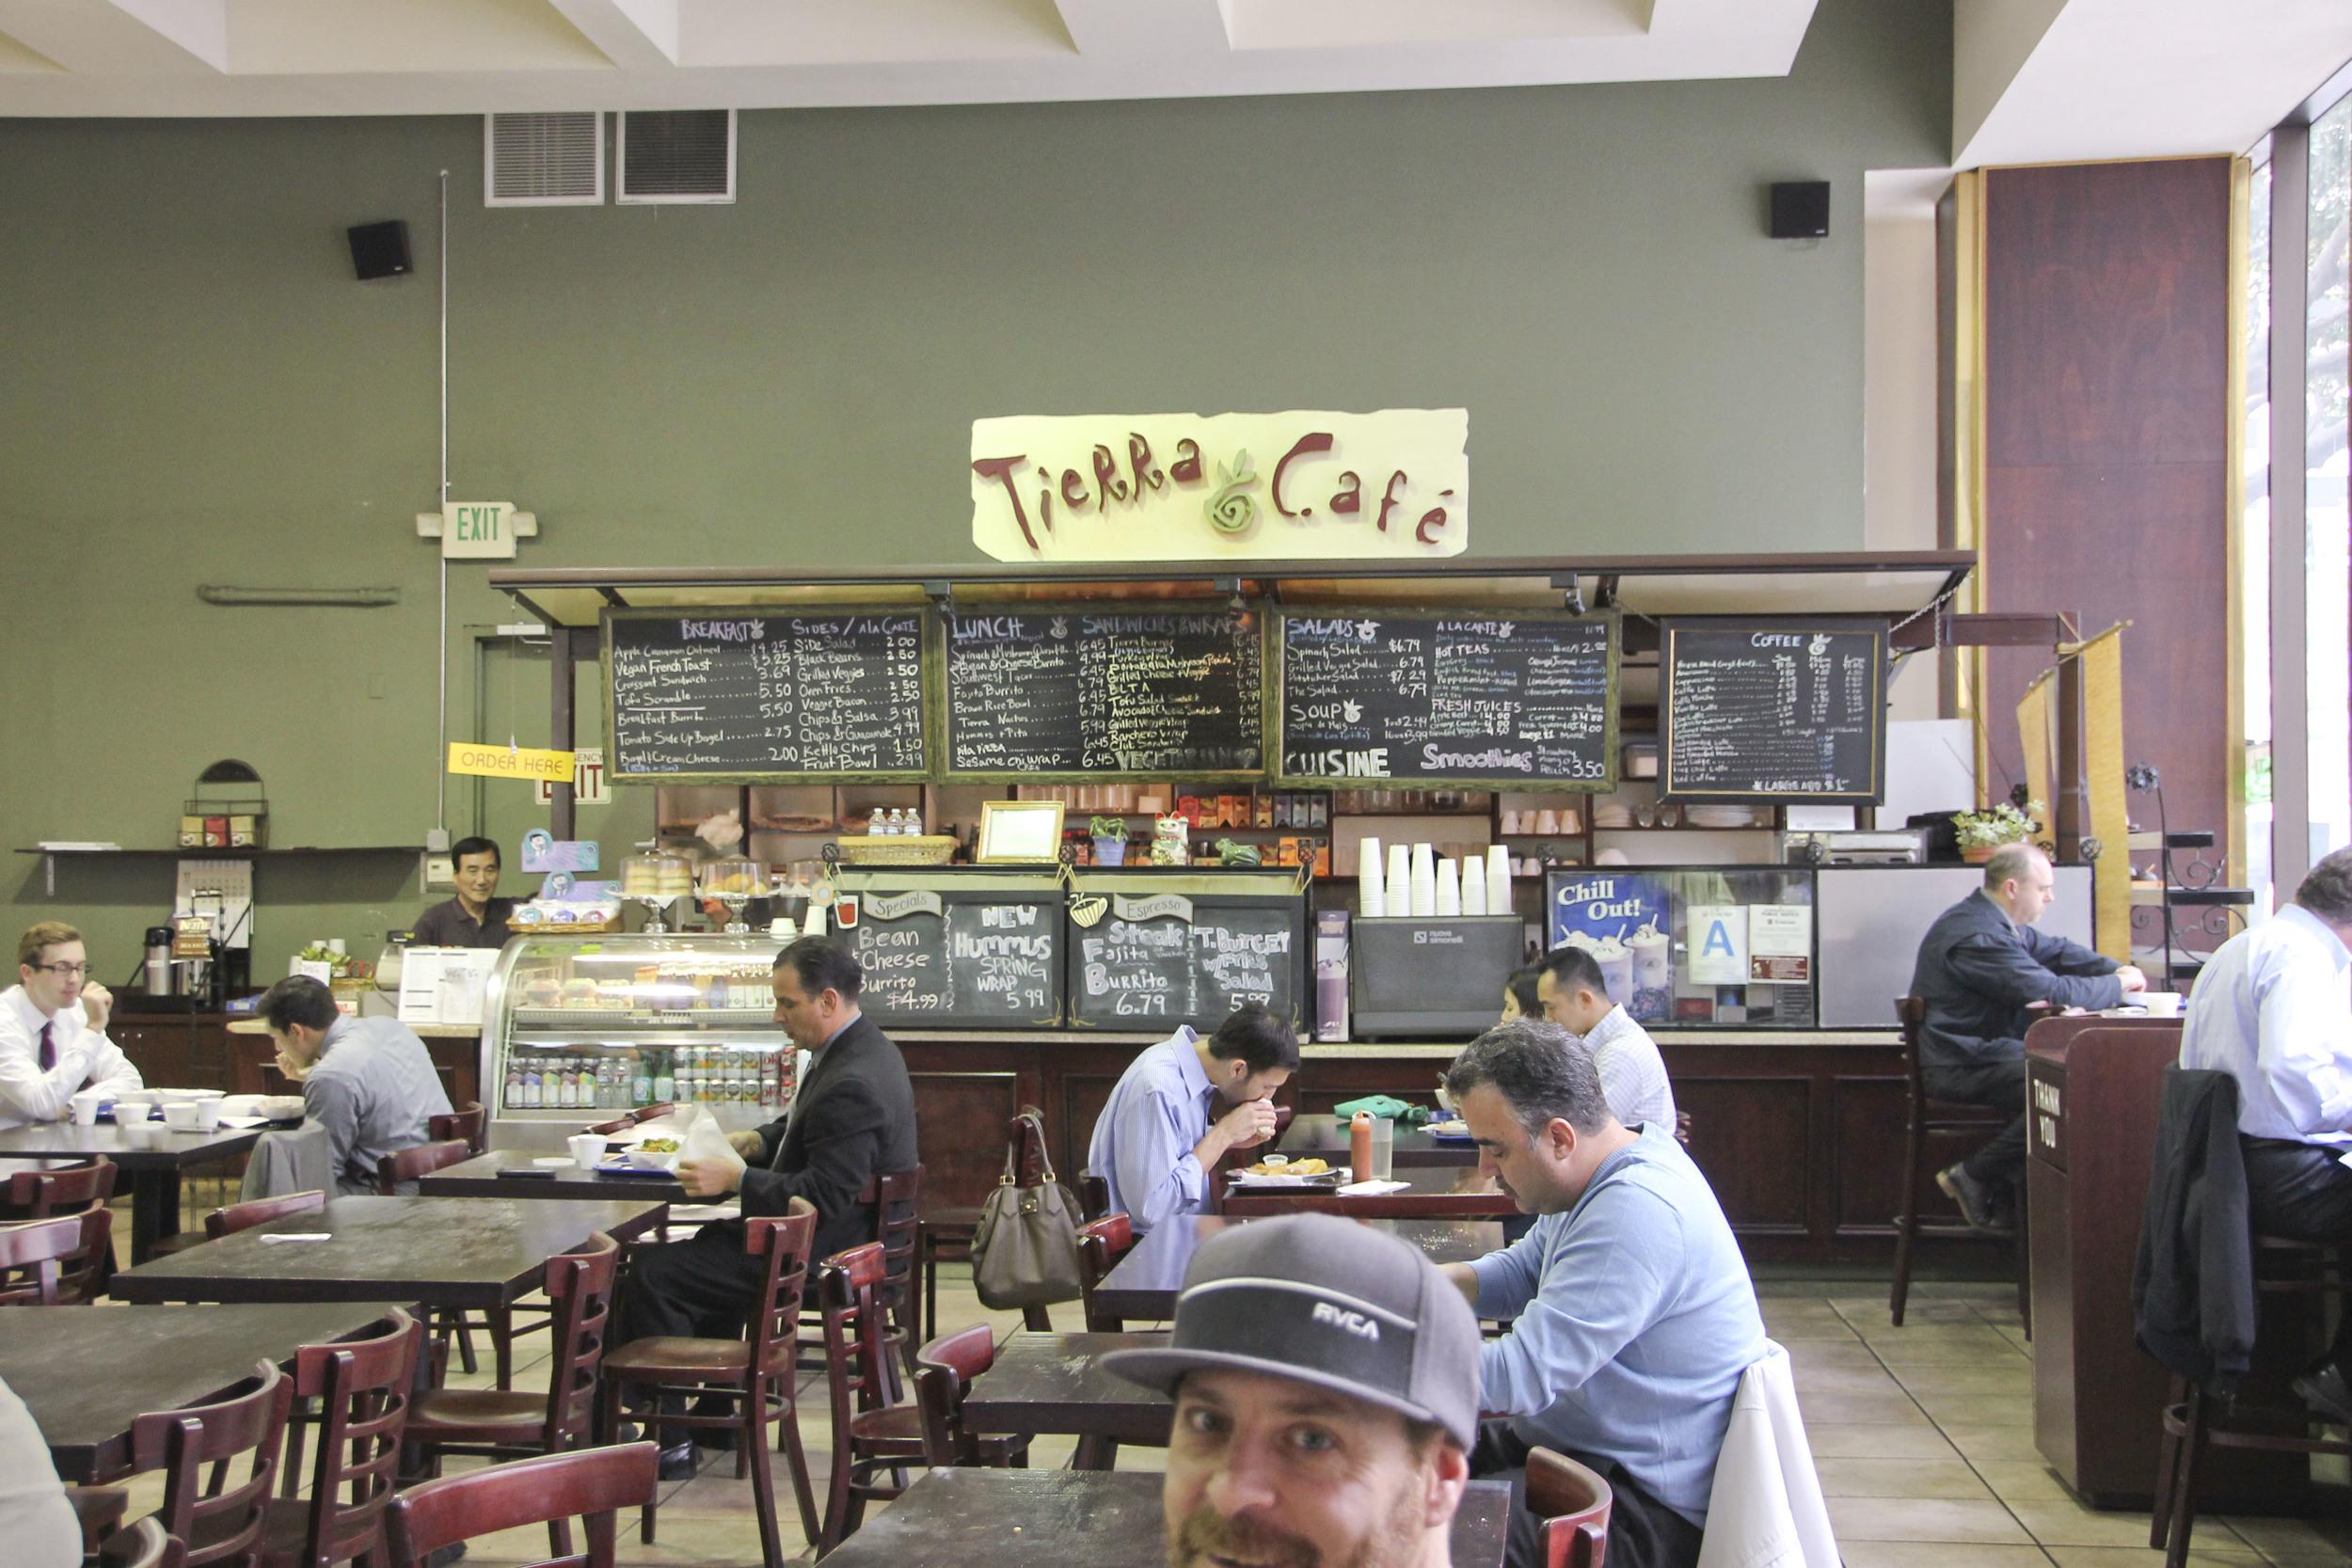 Tierra Cafe Downtown Los Angeles California2550.jpg